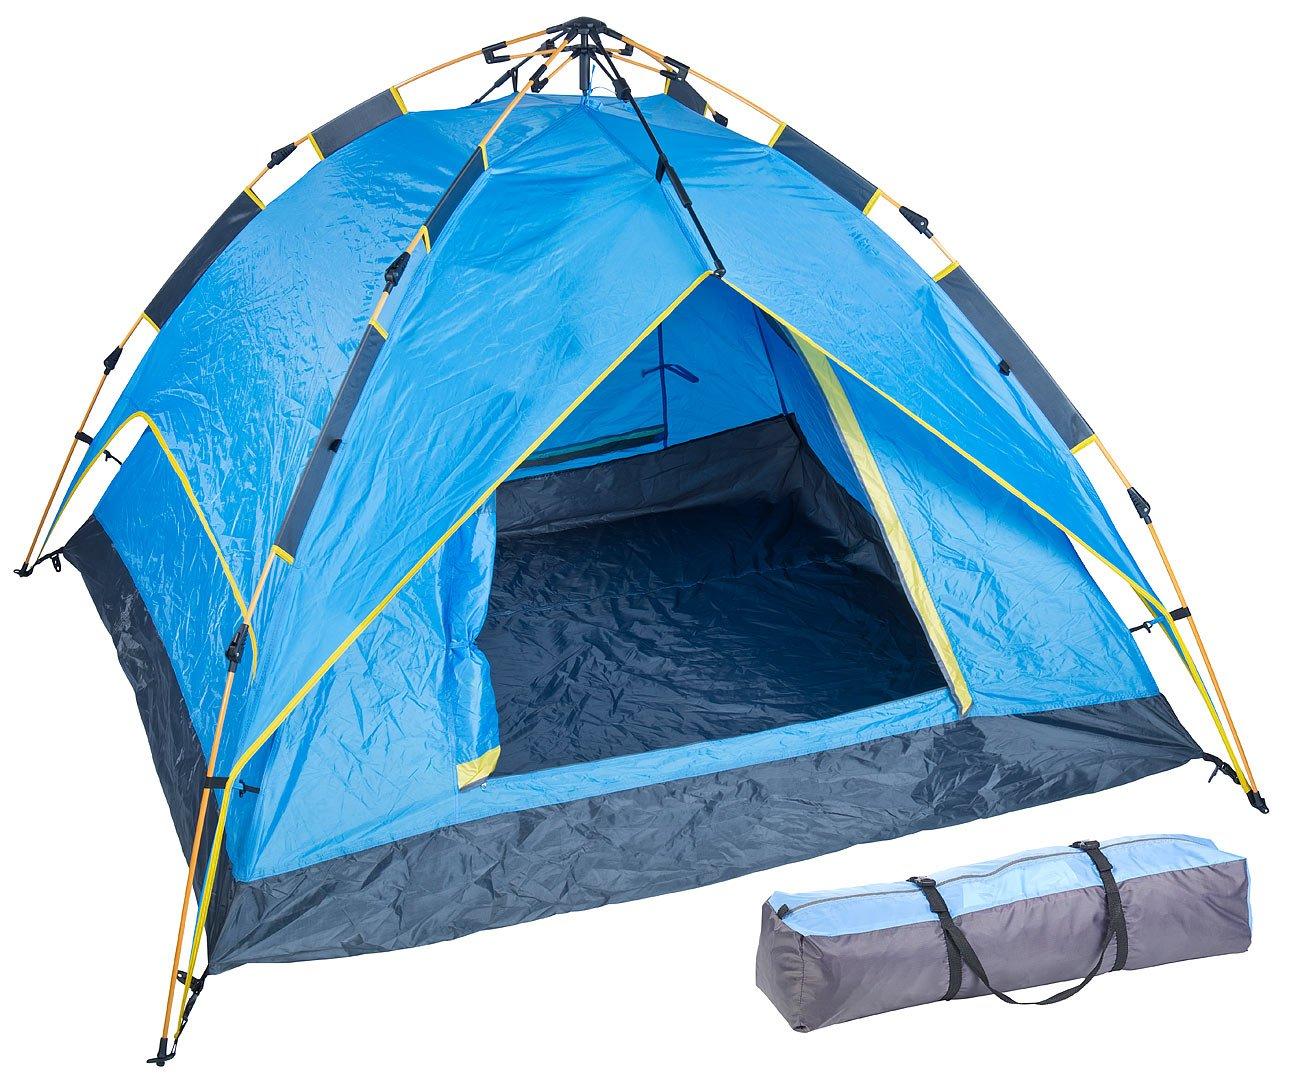 Semptec Urban Survival Technology Zelte: Automatik-Kuppelzelt für 3-4 Personen, 3.000/5.000 mm Wassersäule (Campingzelt)